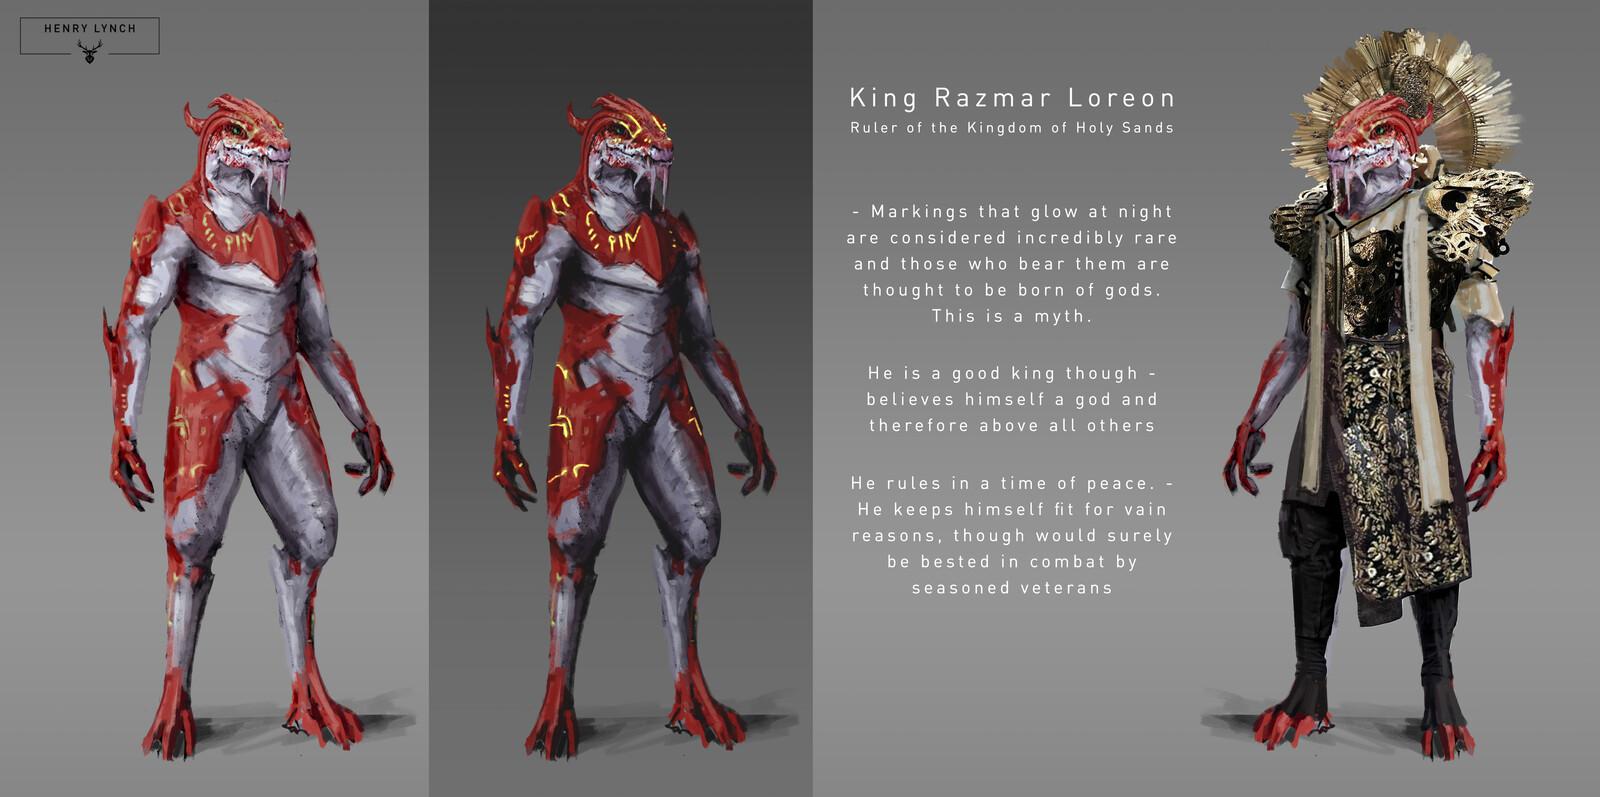 King Razmar Loreon